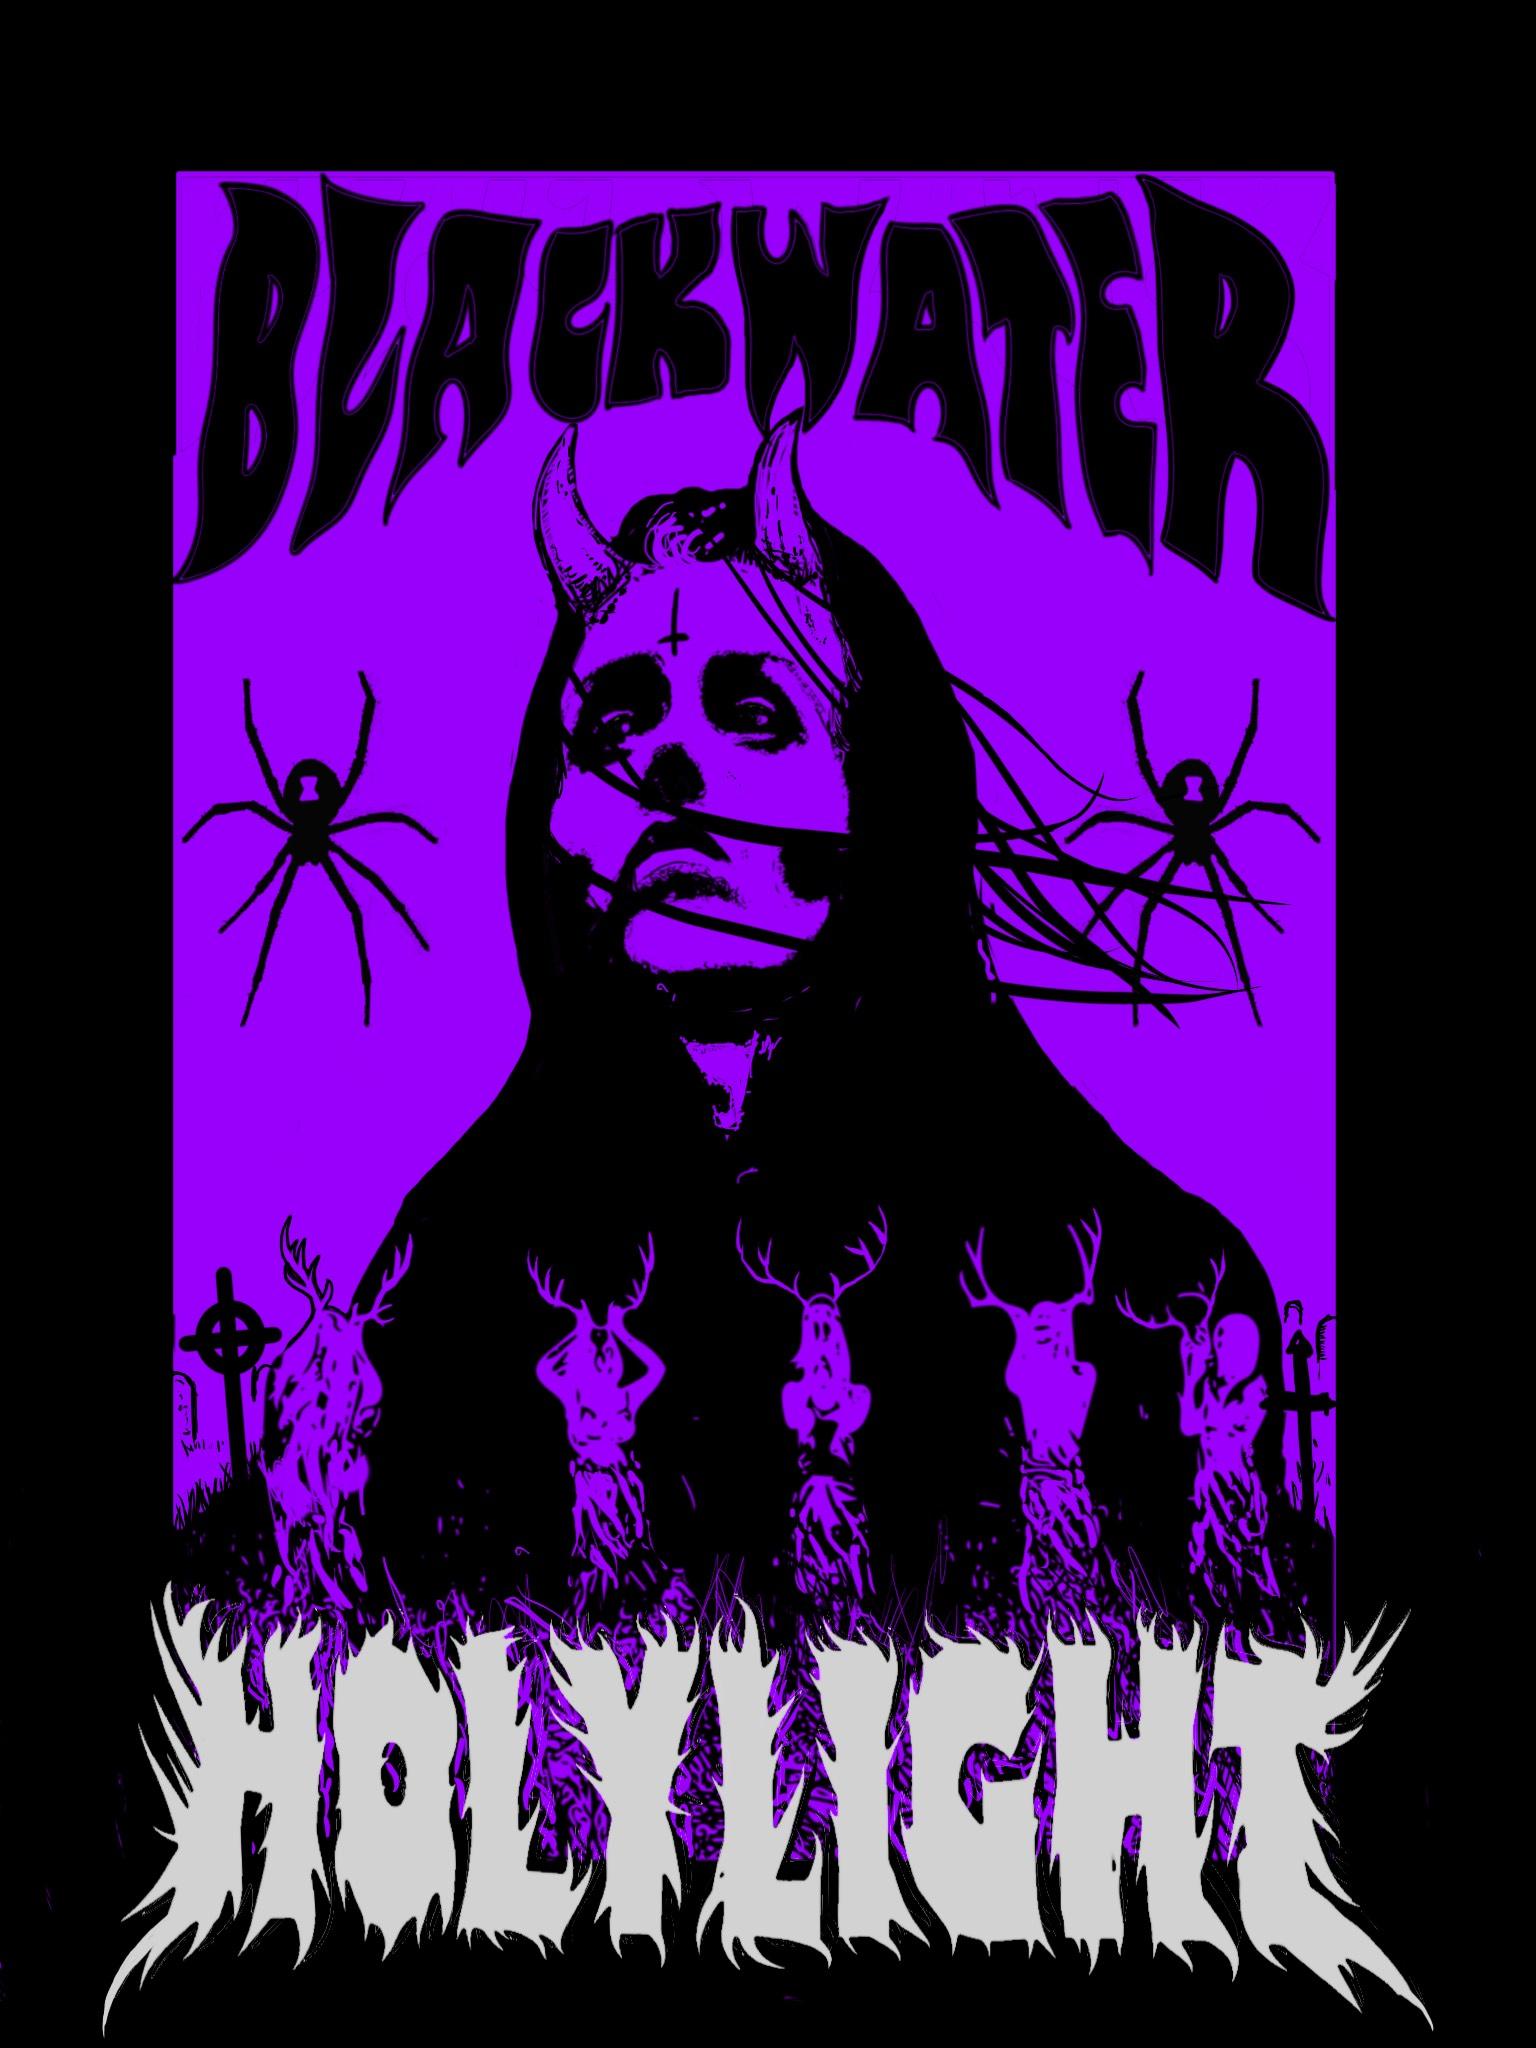 Blackwater Holylight -